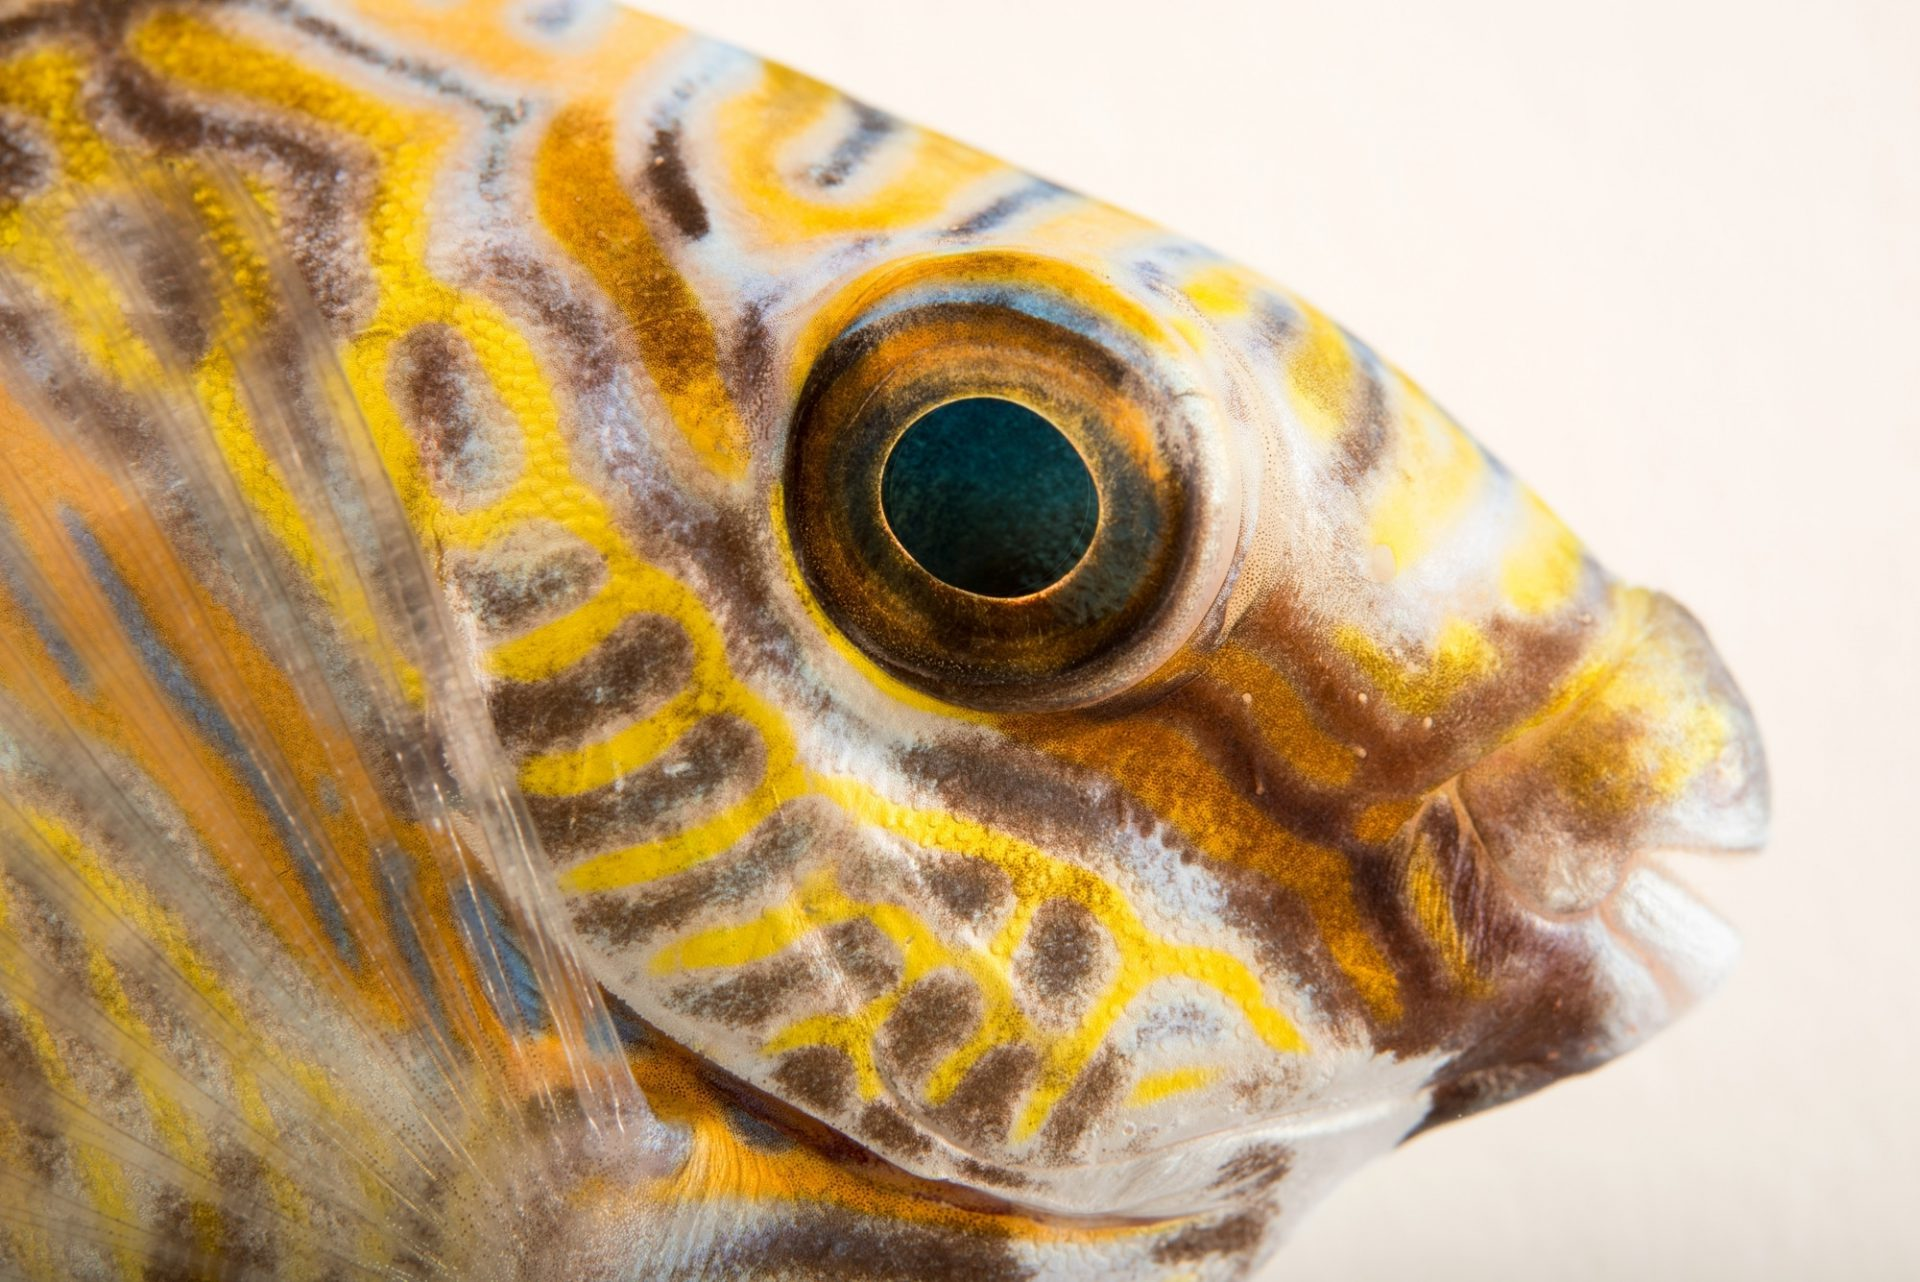 Photo: Scribbled rabbitfish (Siganus doliatus) from Gulf Specimen Marine Laboratories.